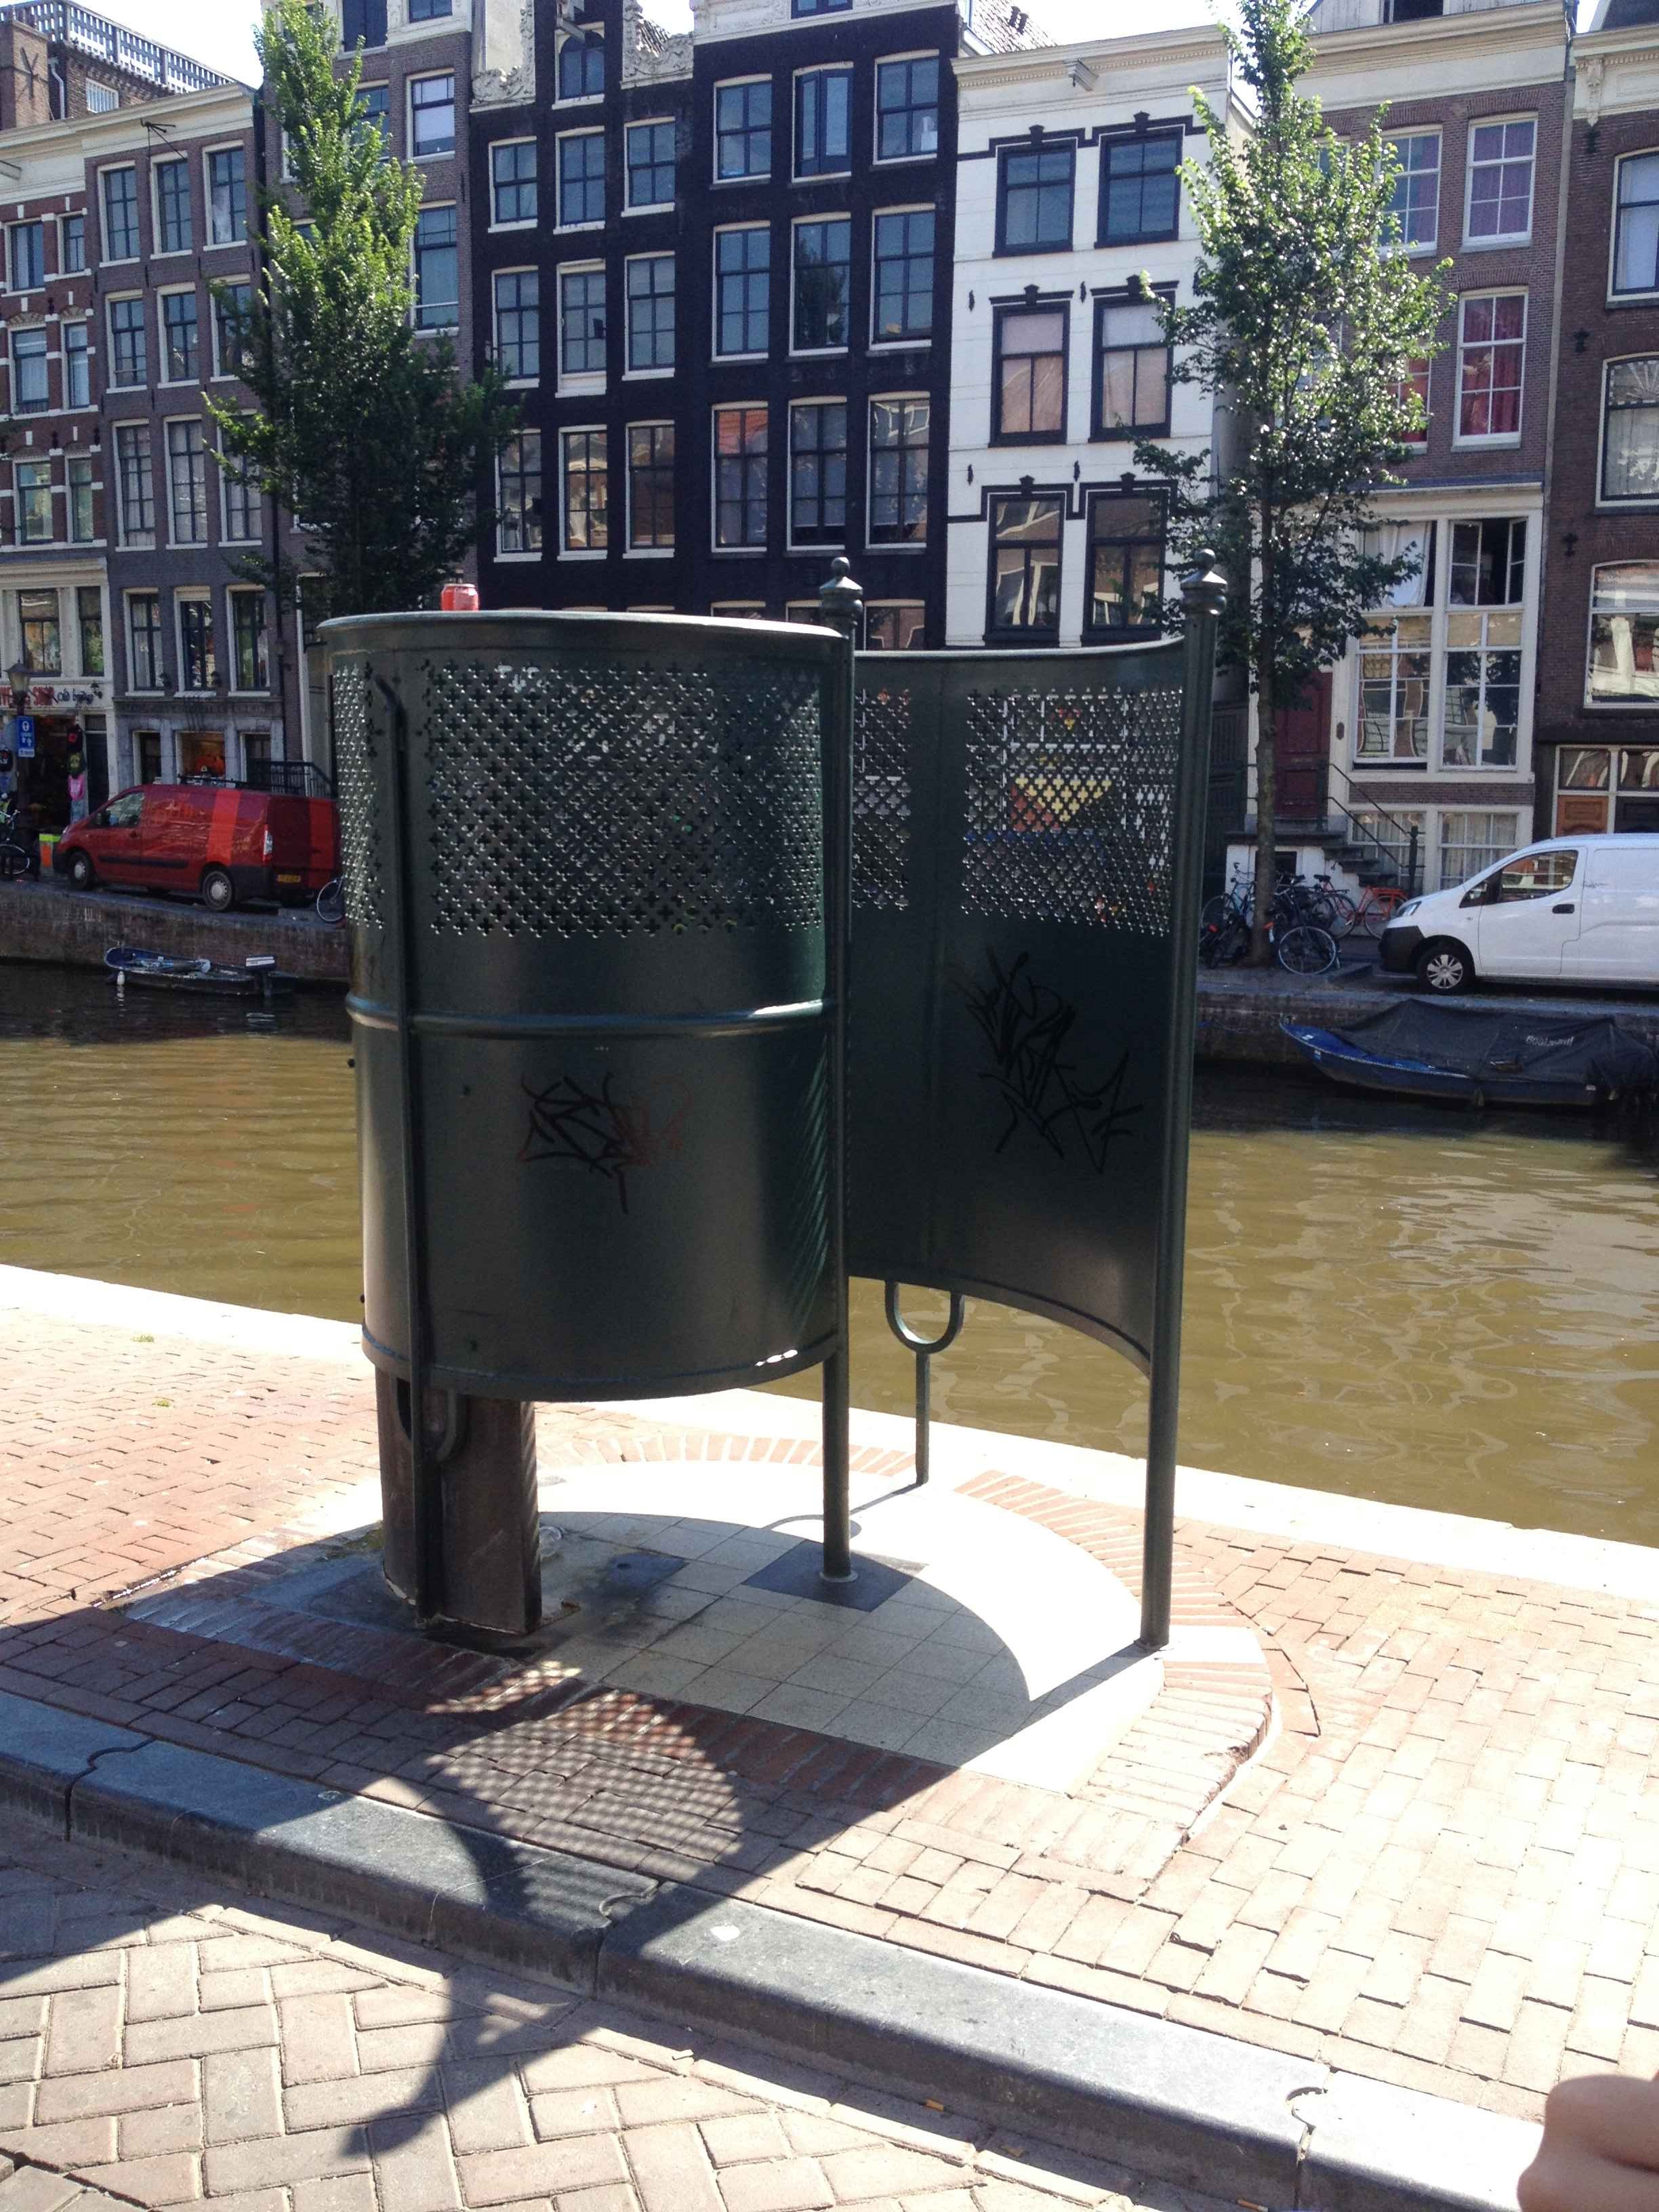 Amsterdam Urinal